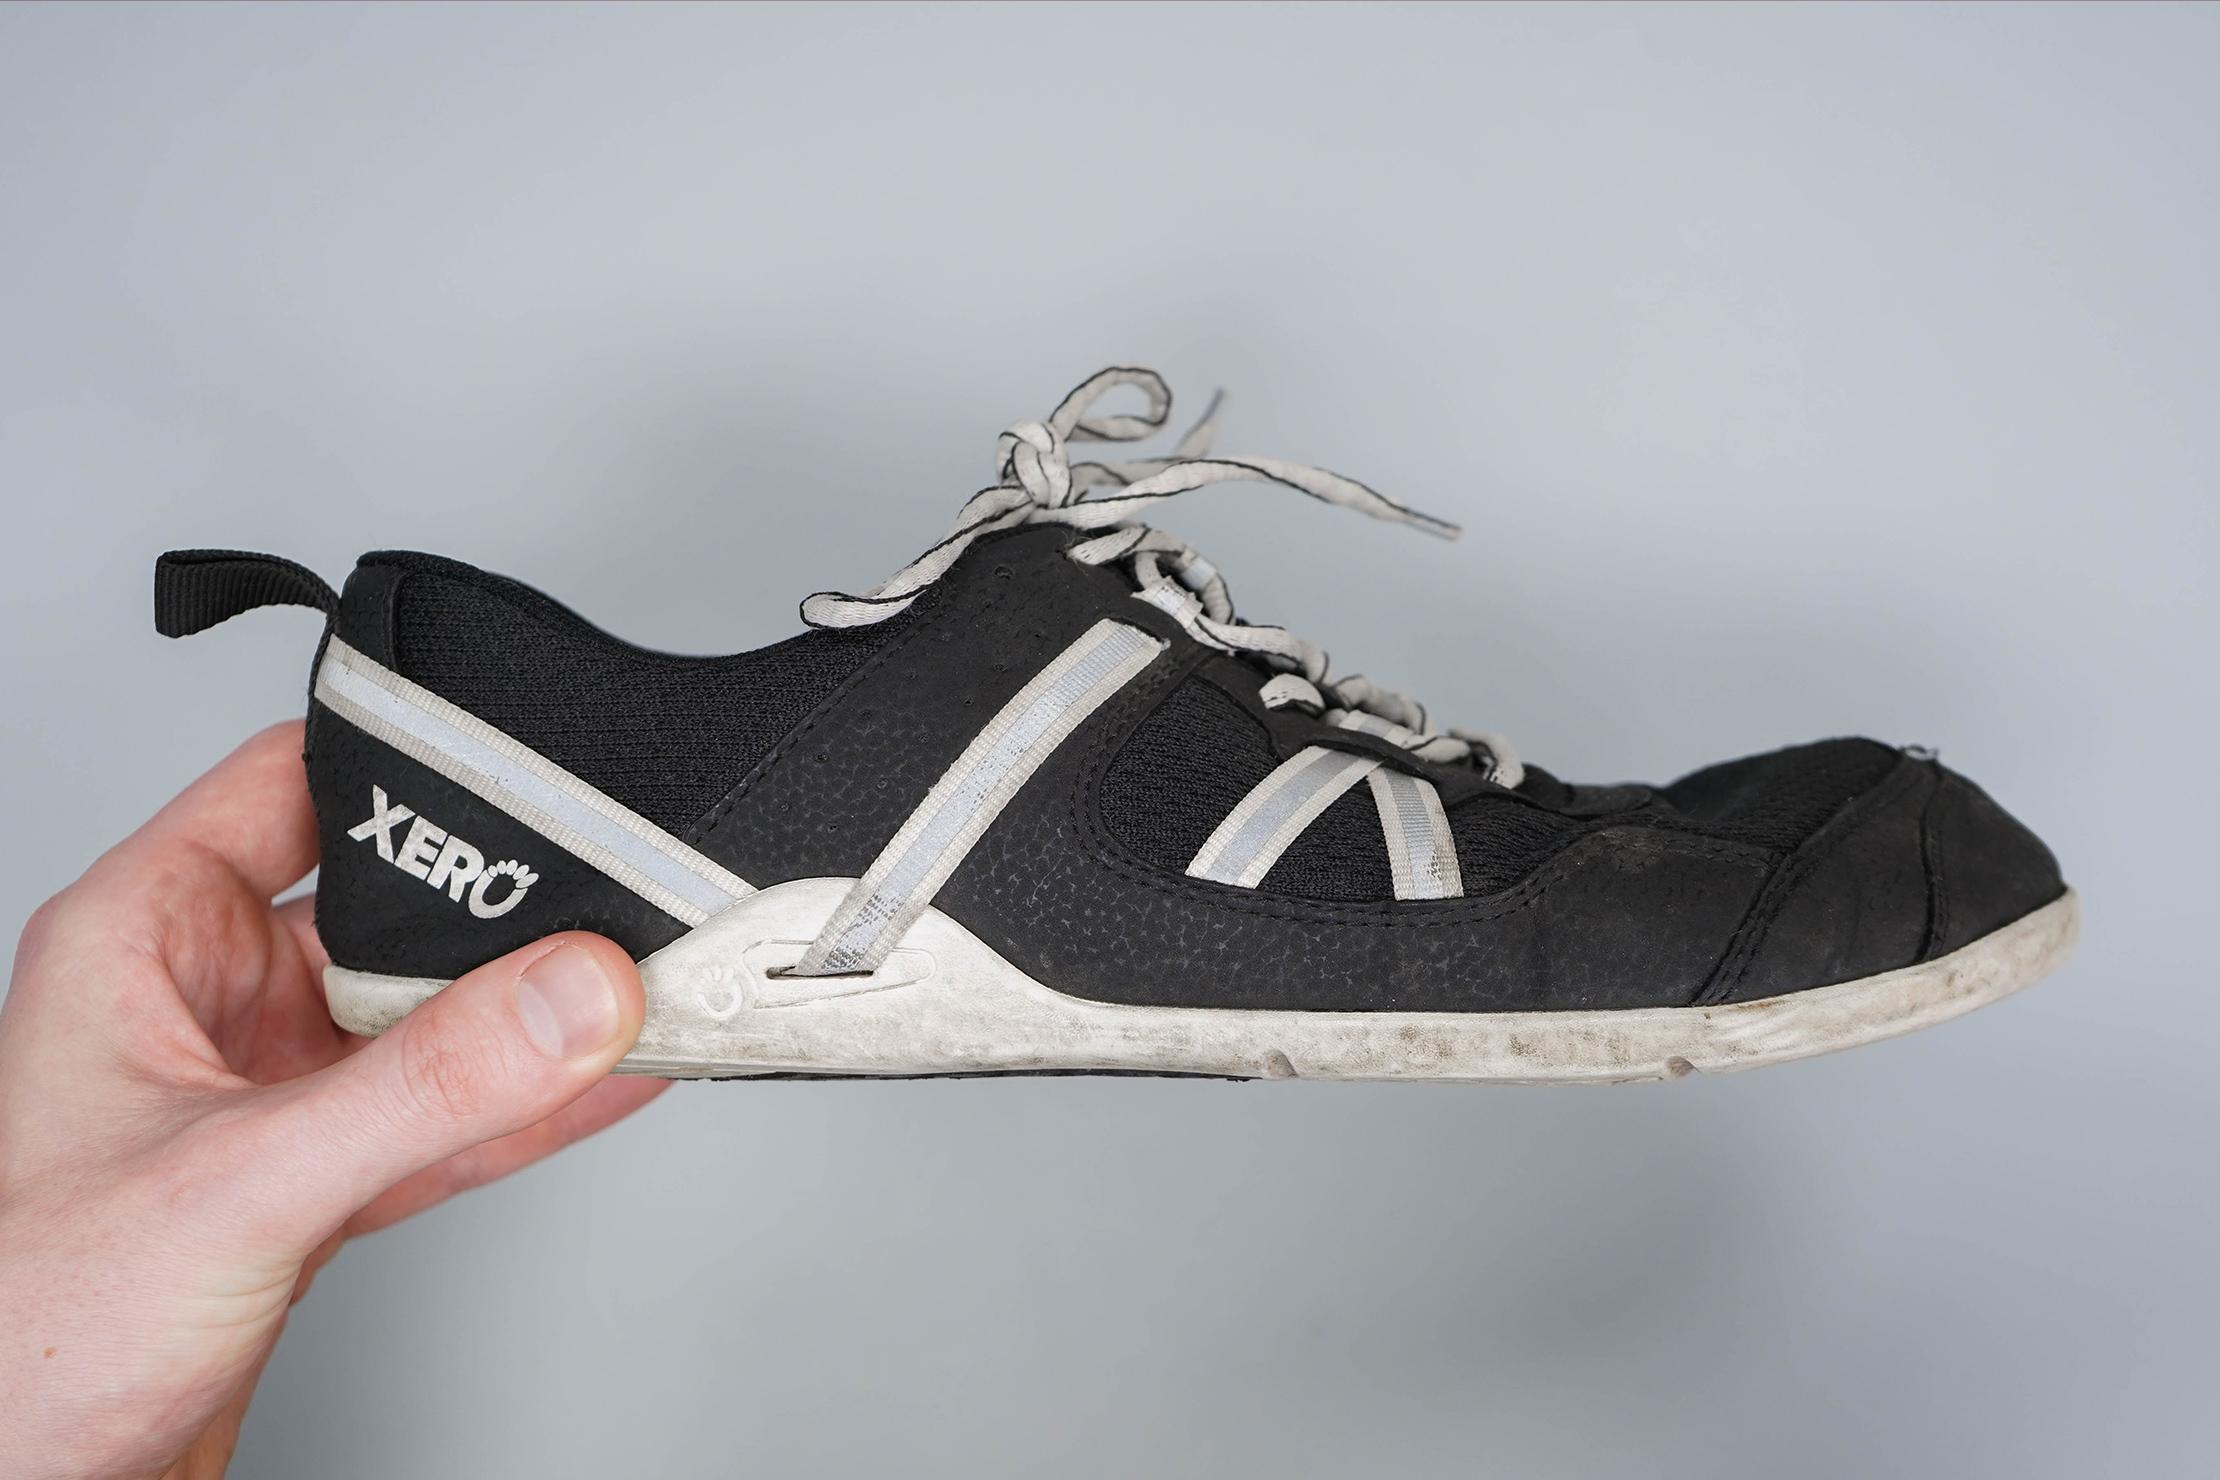 Xero Shoes Prio Zero Drop